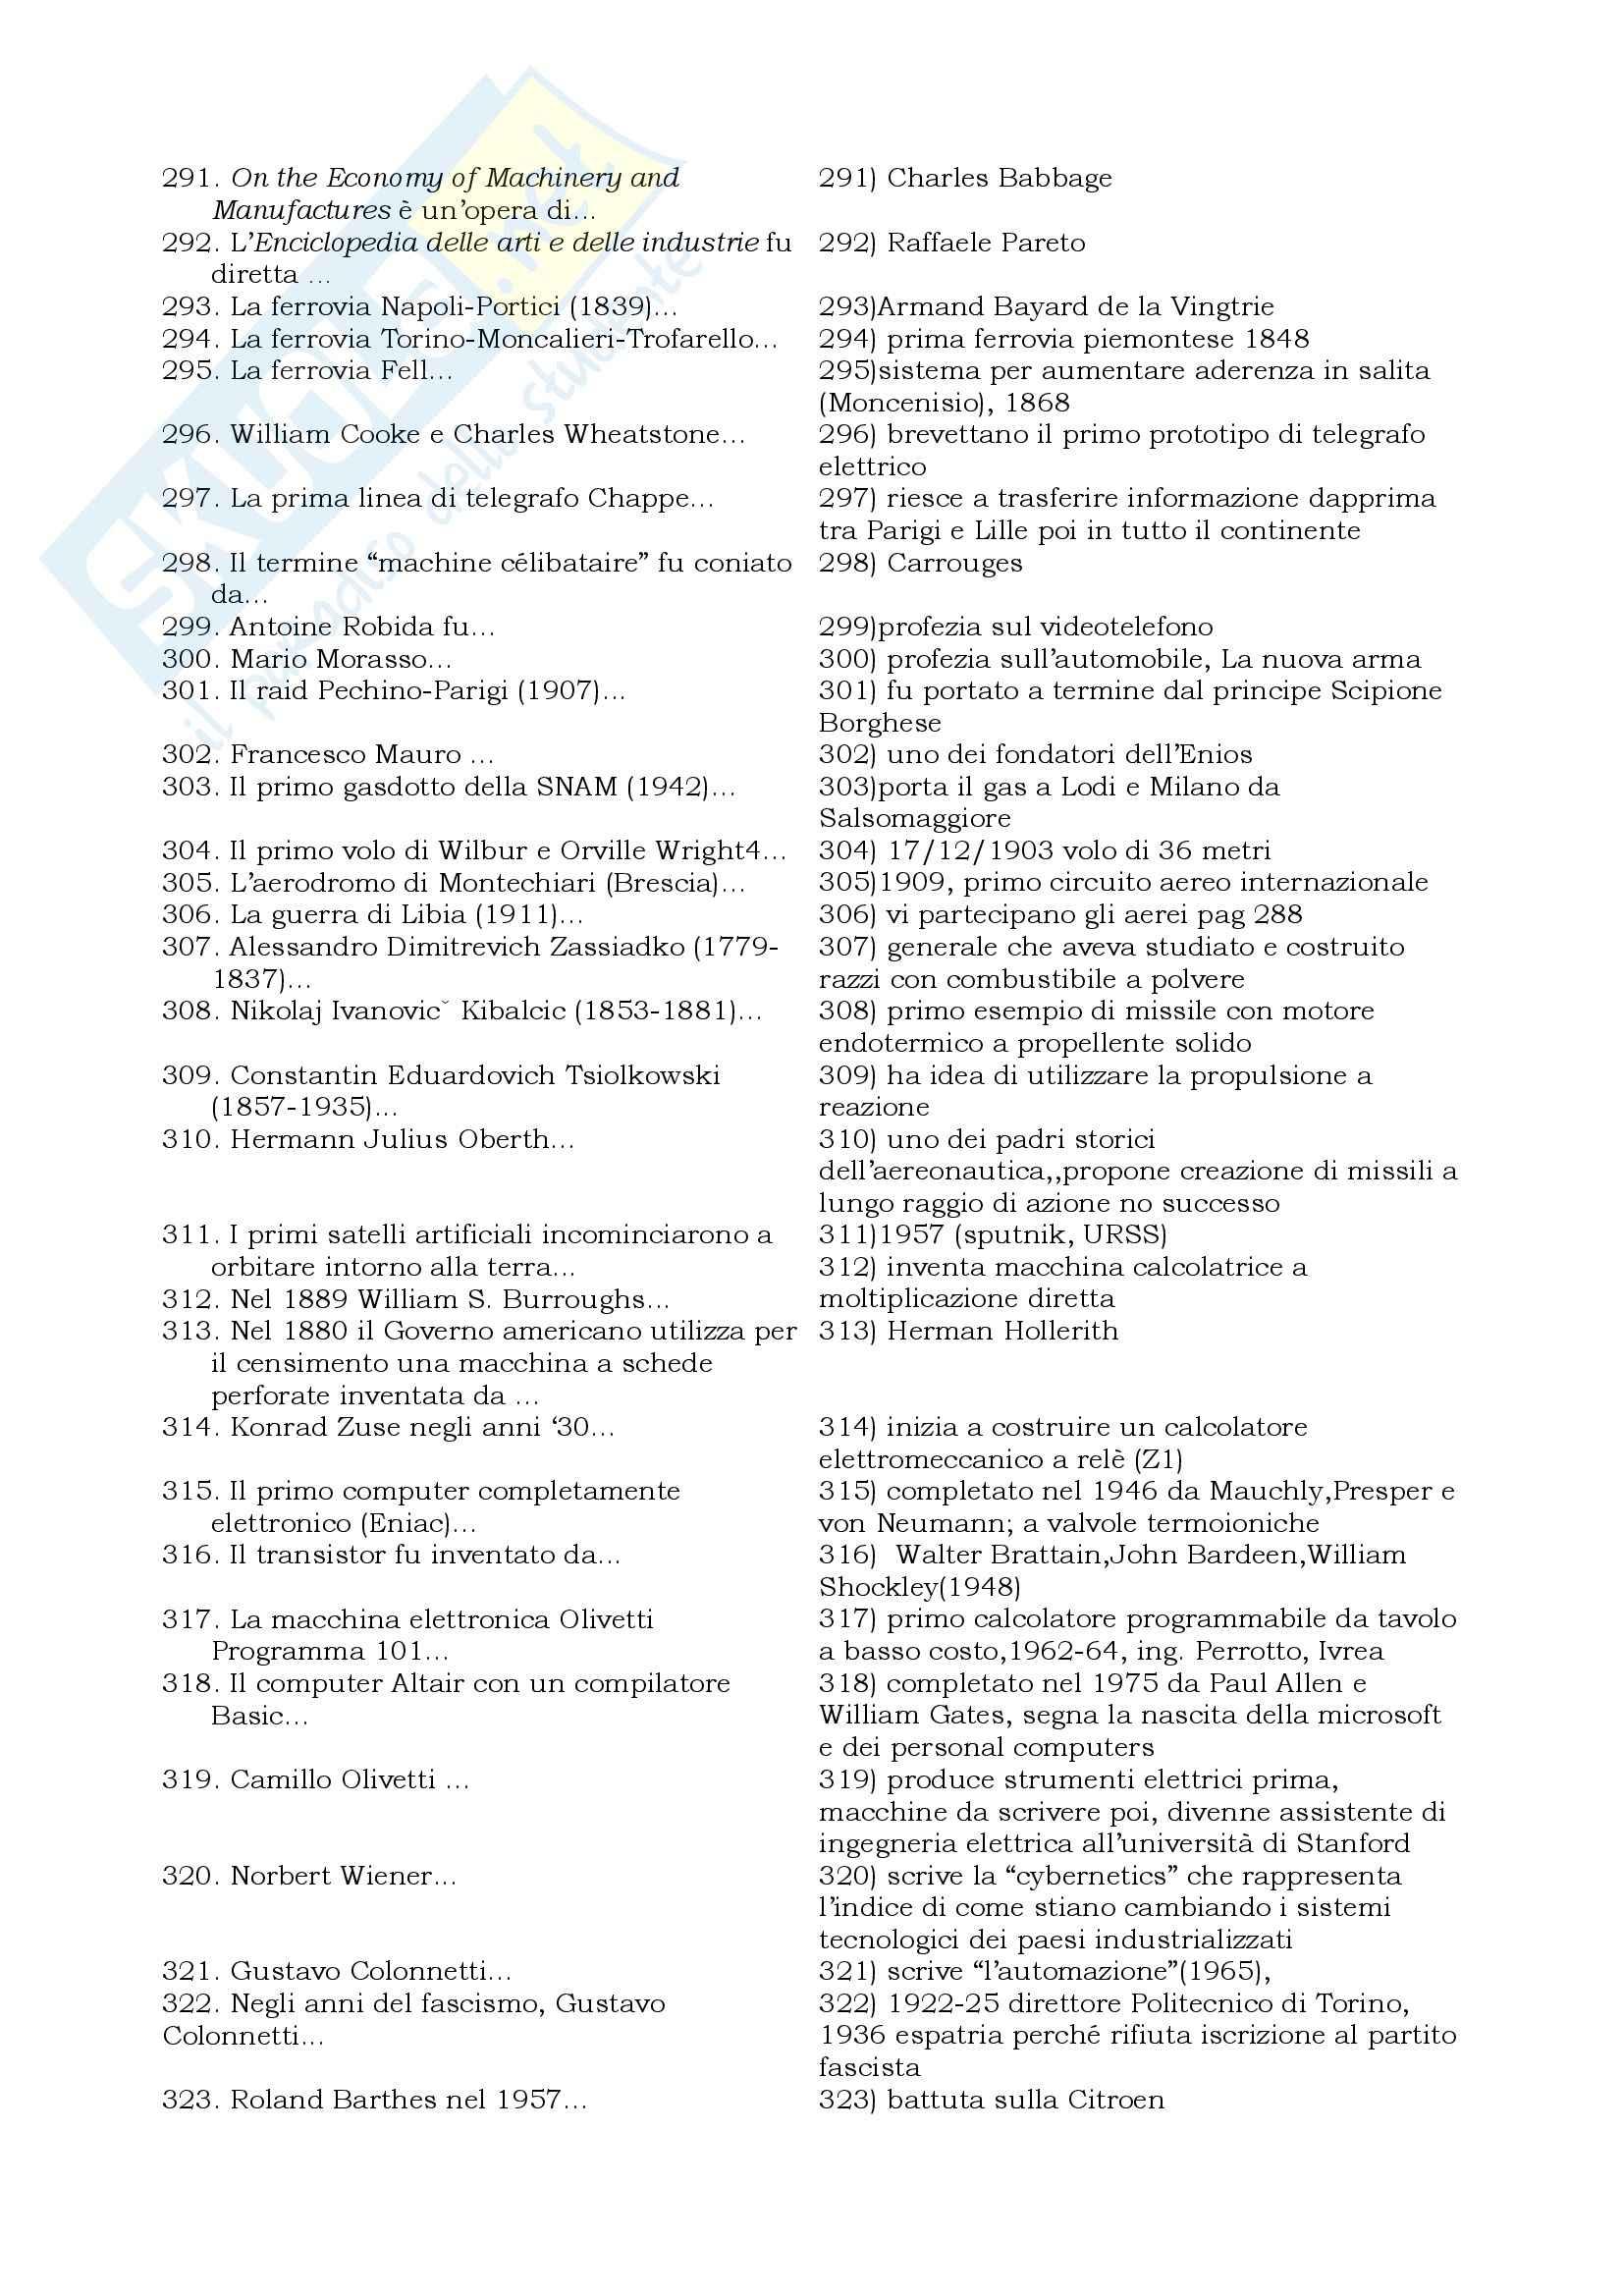 Storia della Tecnologia - Database Quiz Pag. 11